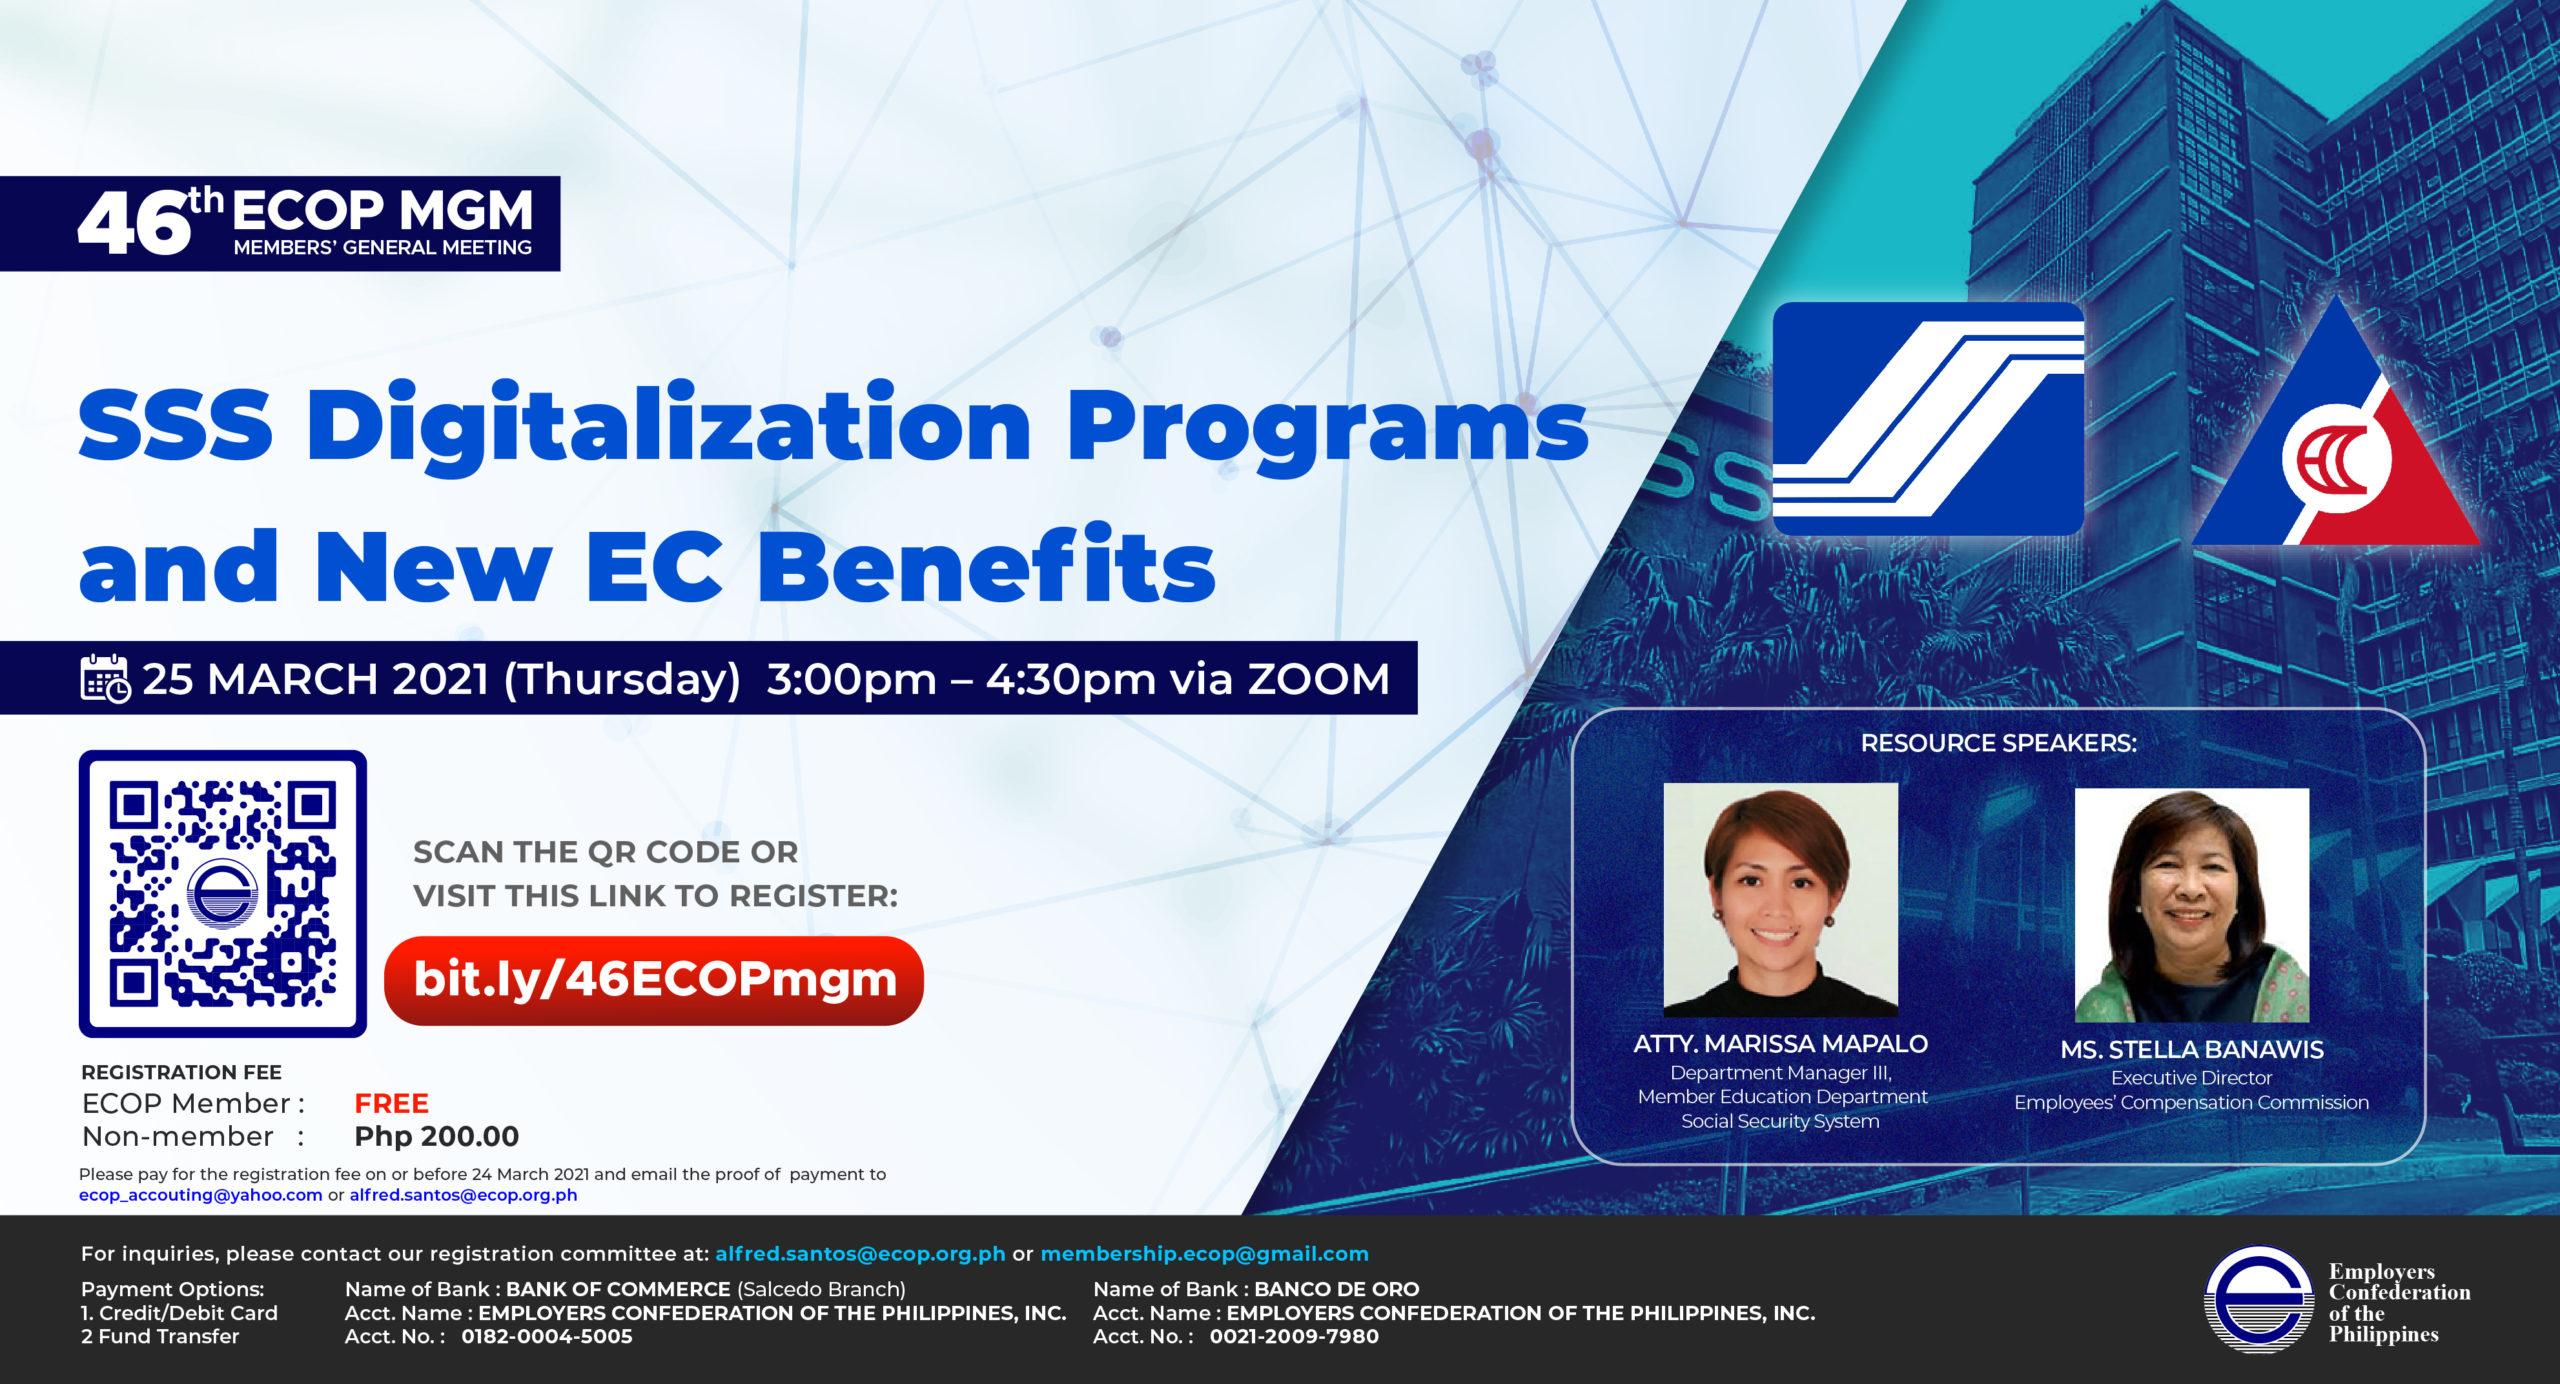 SSS Digitalization Programs and New EC Benefits